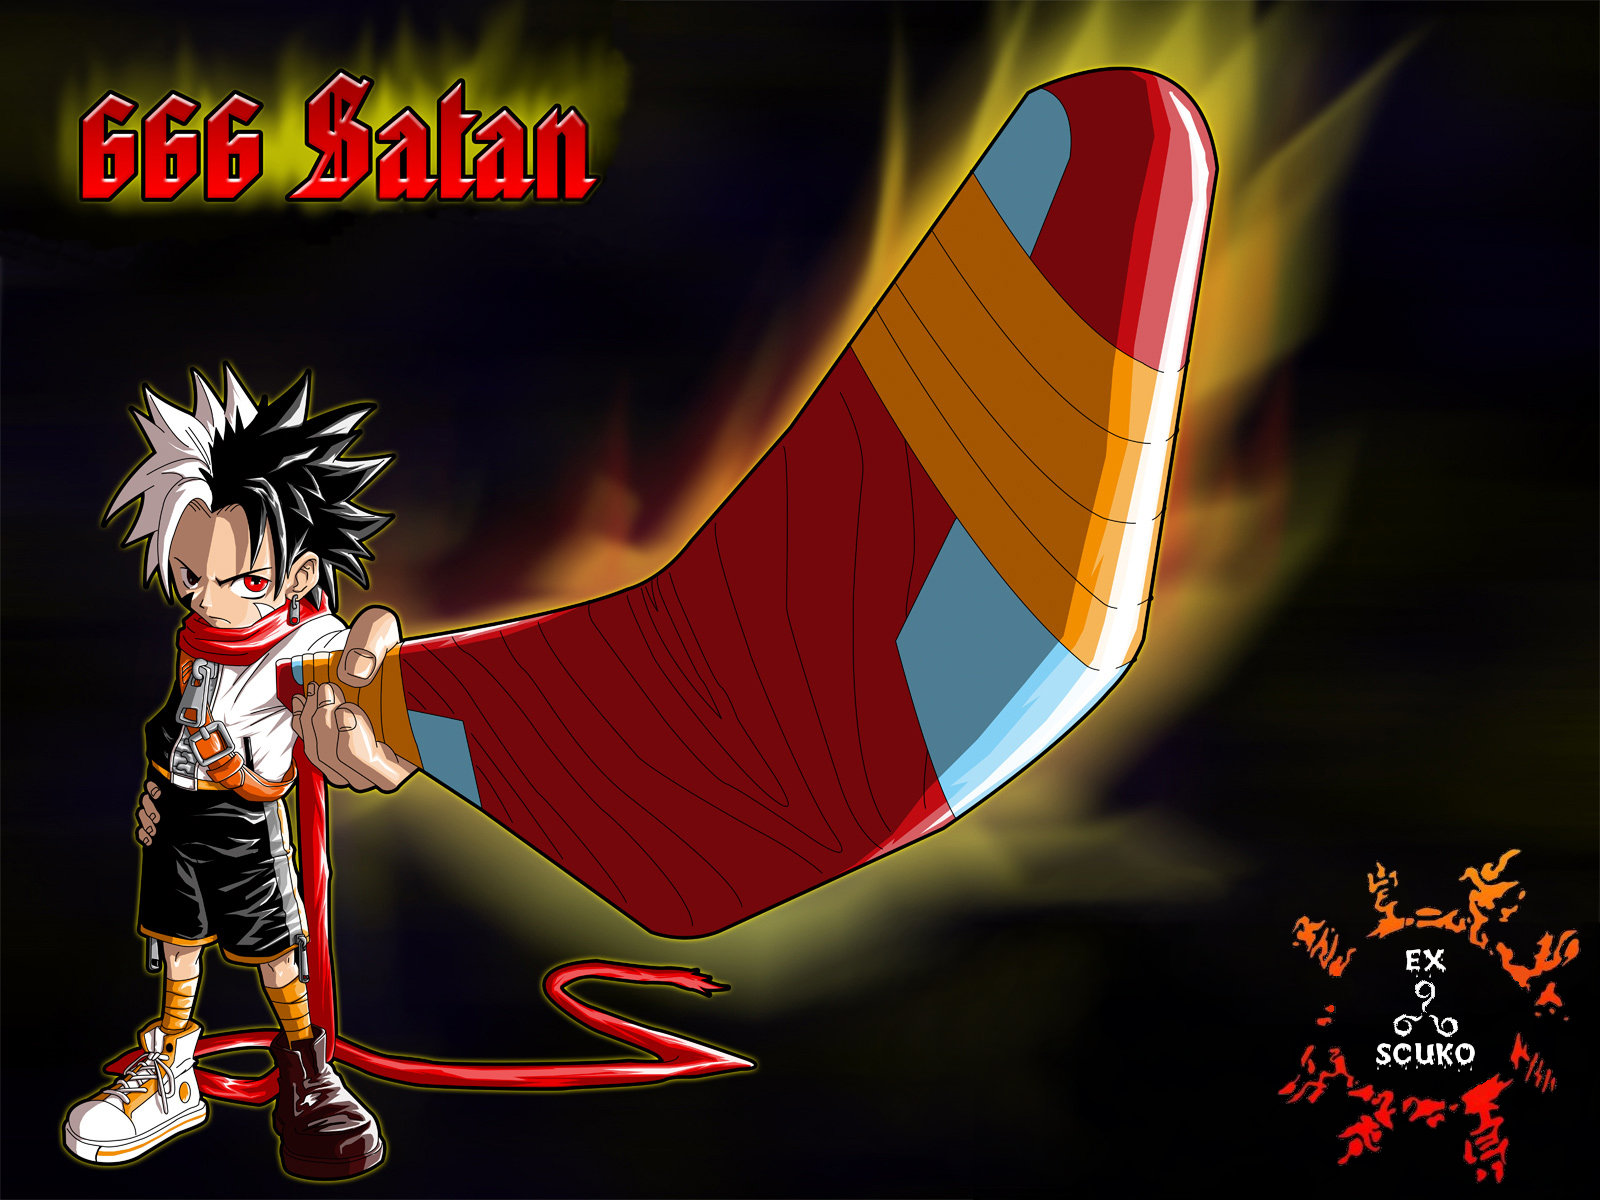 Манга Онлайн - 666 Satan / 666 Сатана 9 # 35 Обещание - Страница №1 - 666 Satan